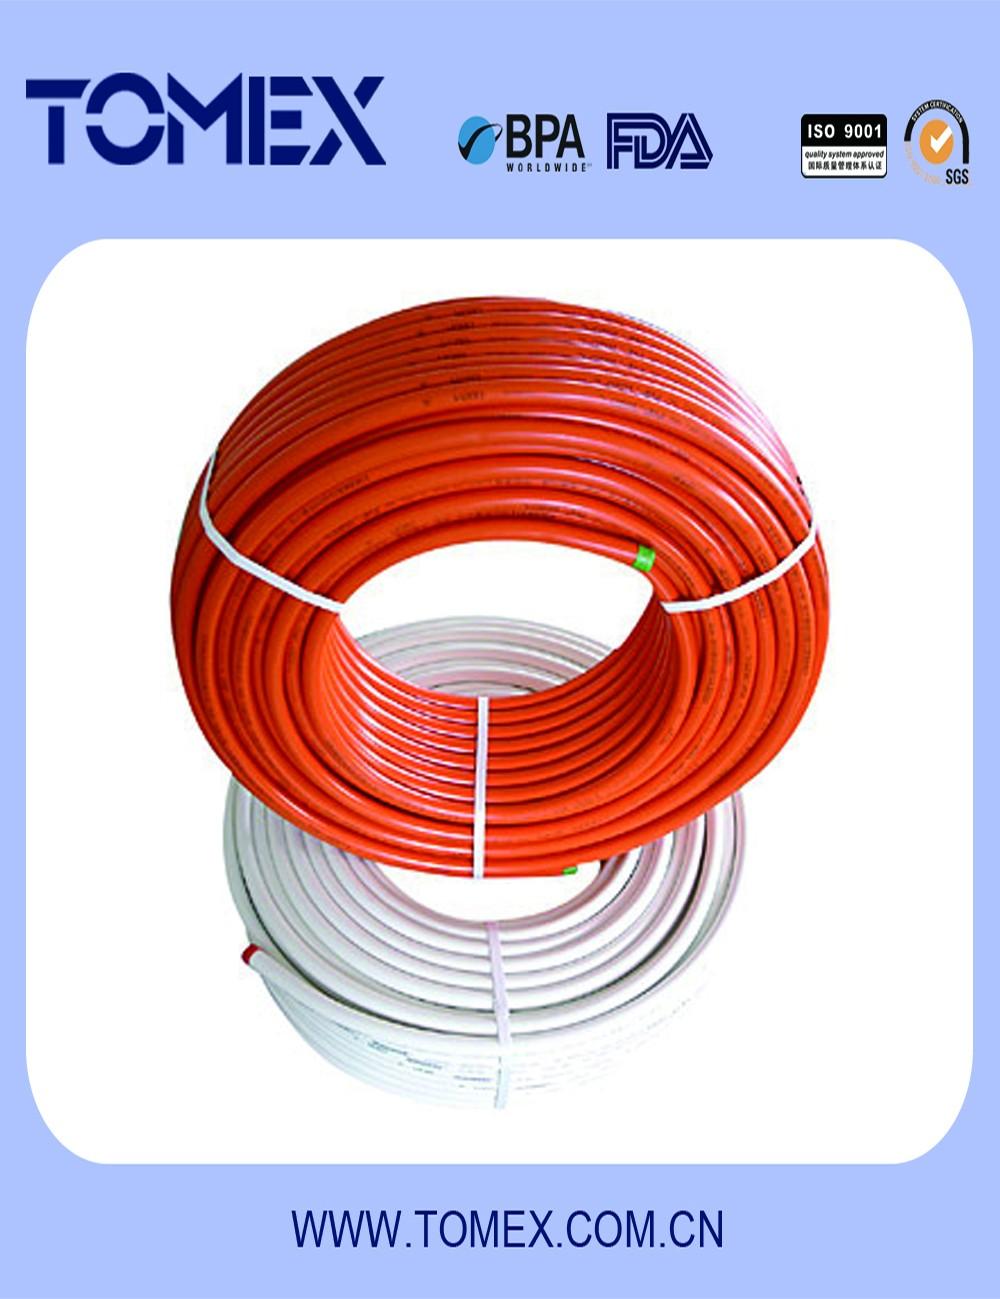 Ppsu pc material pex pipe fitting tee for canada market for Come collegare pex pipe al rame